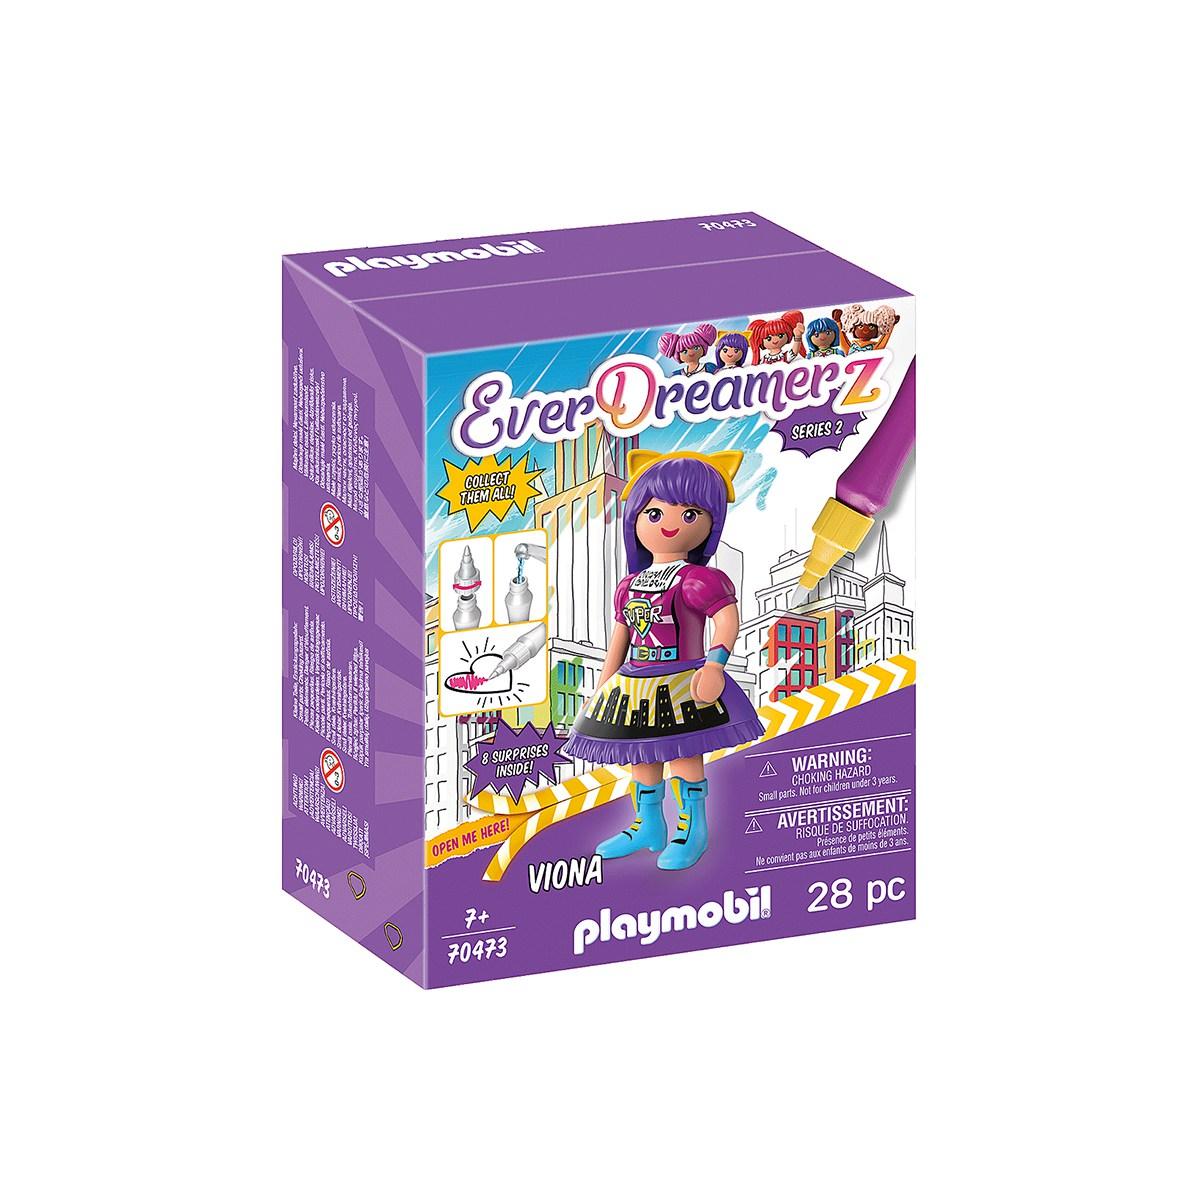 PLAYMOBIL BIONA COMIC WORLD 70473